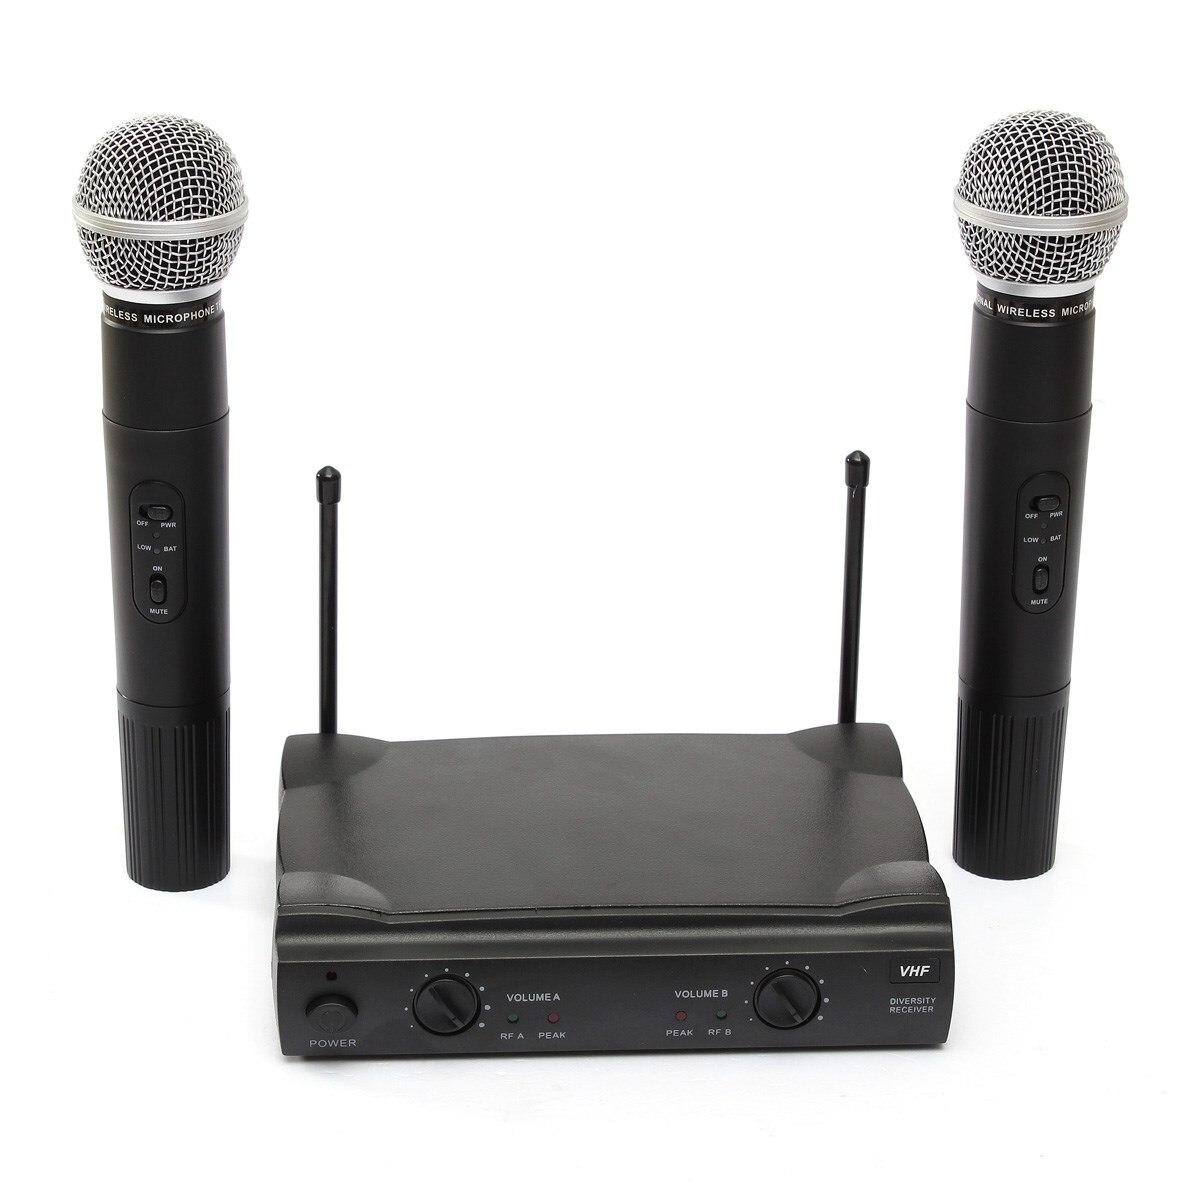 ФОТО Best Professional 2 Dual Wireless Cordless Handheld Microphone Mic Receiver DJ KTV Club Party Concert Home Microphone US Plug